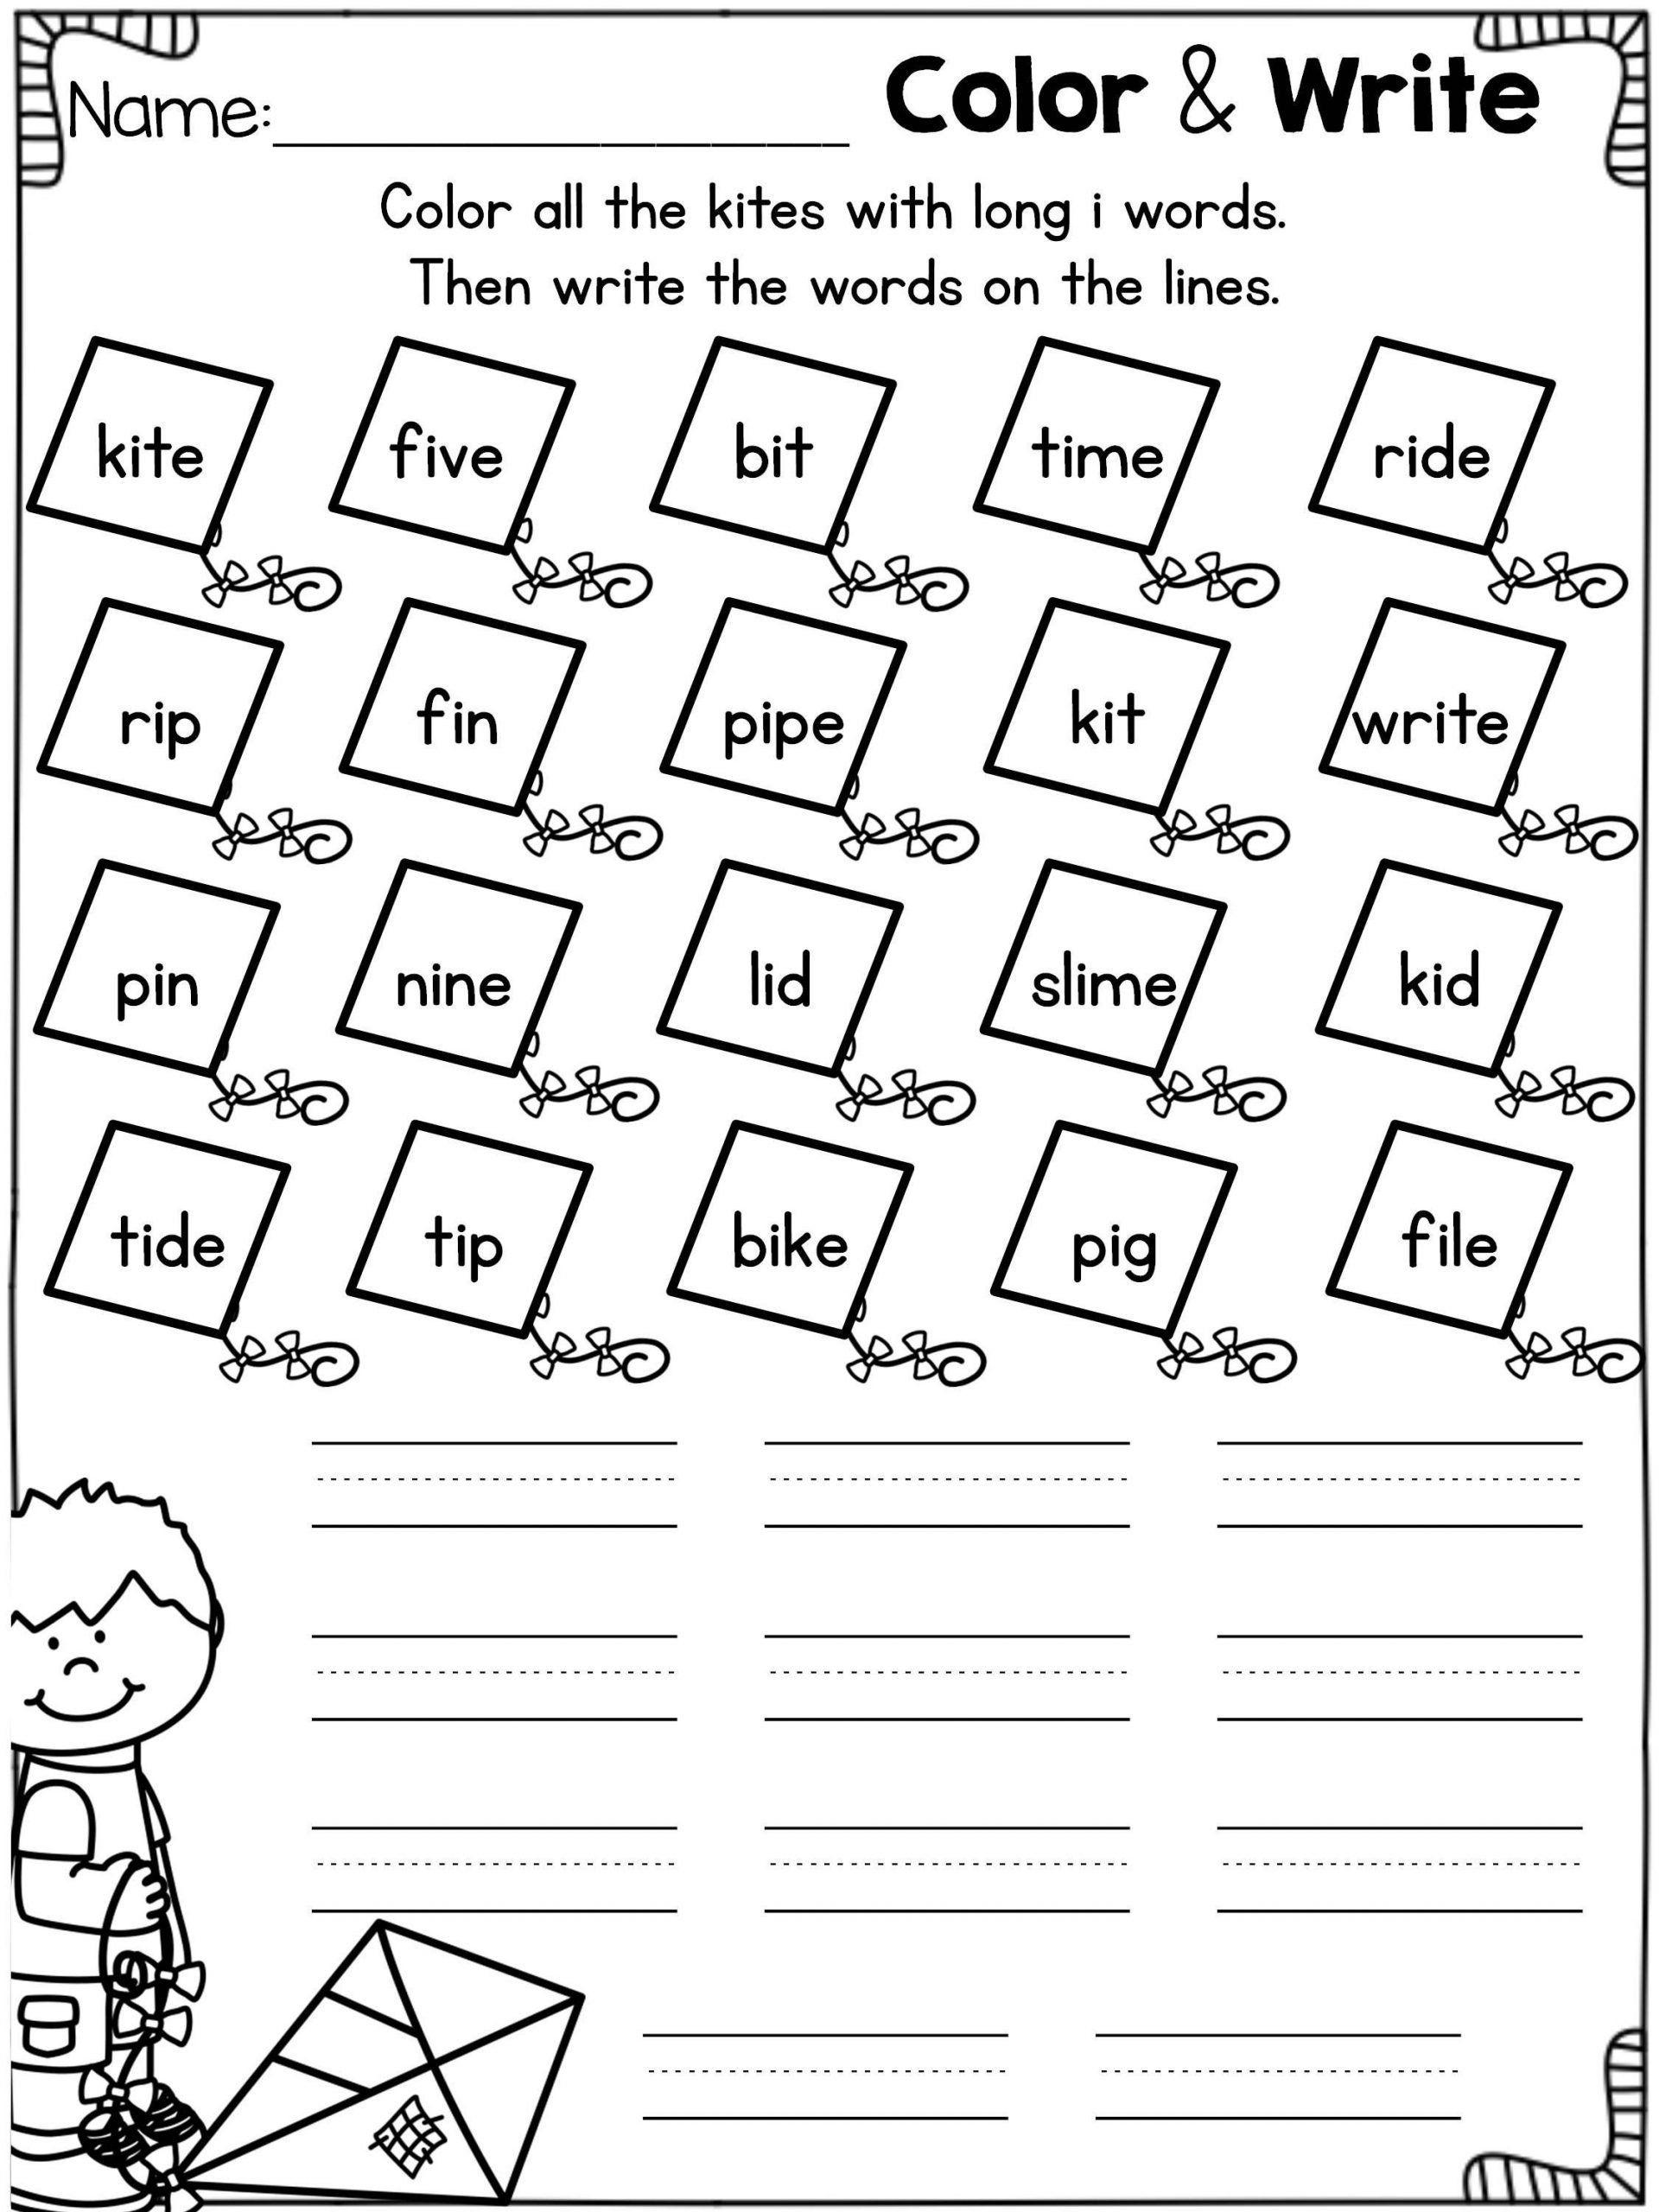 Vowel Worksheets For First Grade Long Vowel Worksheets And Activities Cvce Words Bundle Long Vowel Worksheets Vowel Worksheets Phonics Worksheets Free vowels worksheets for kindergarten